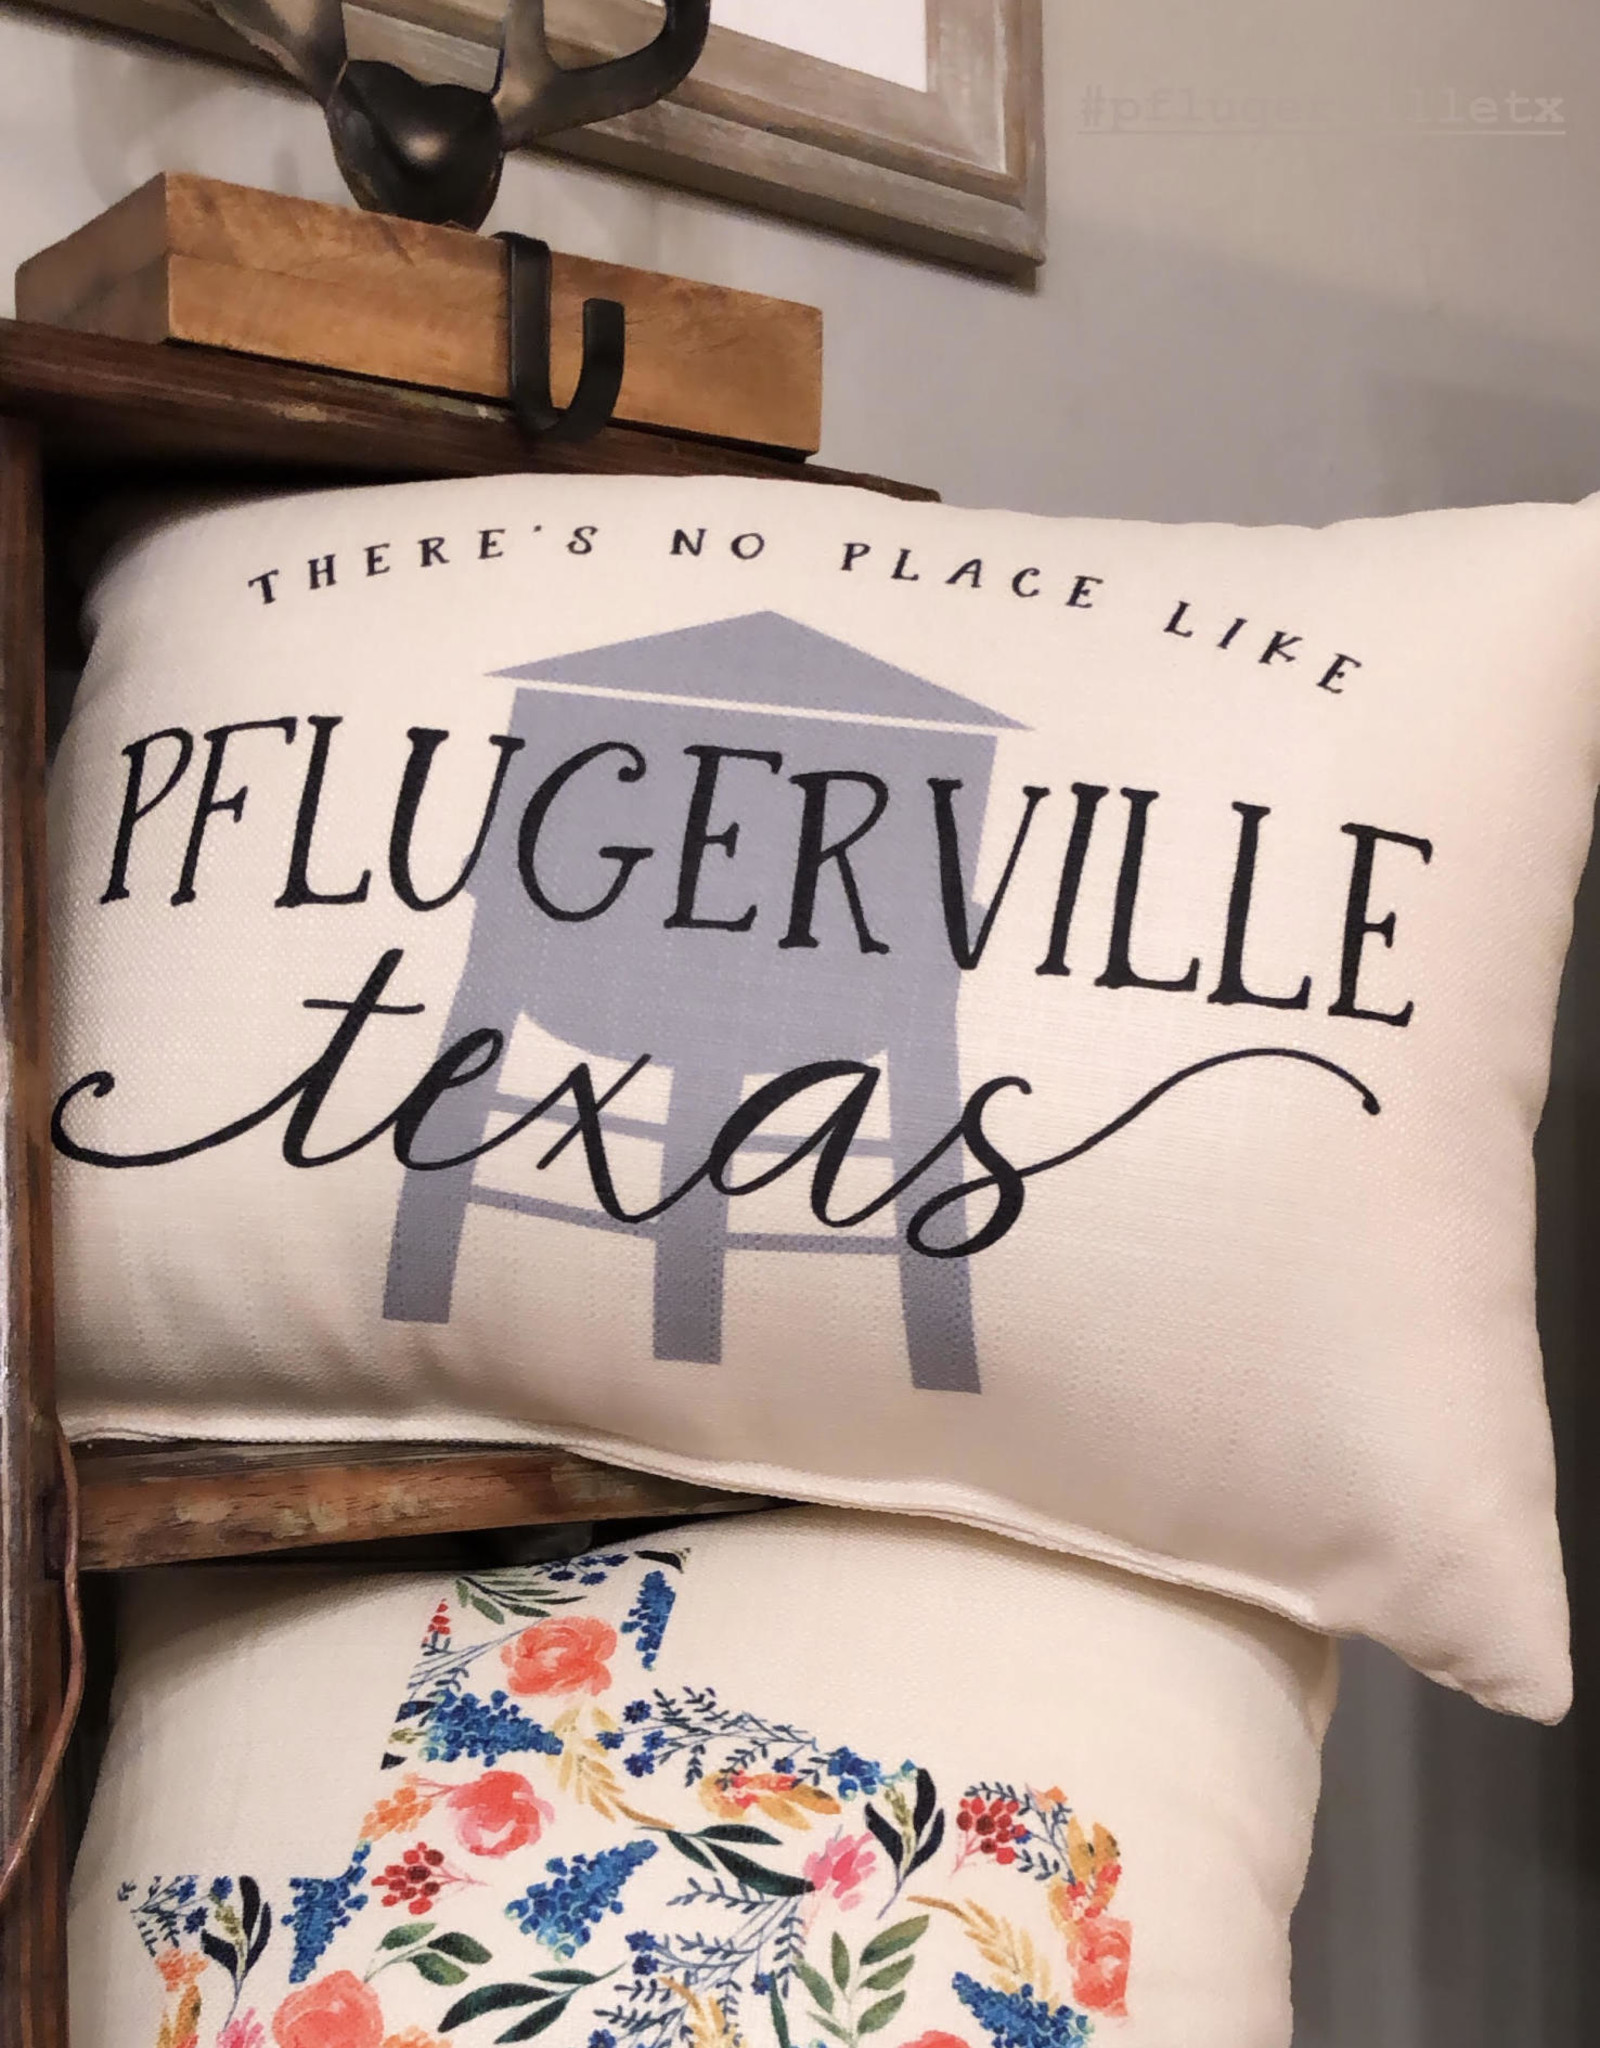 Wink Pflugerville Texas Pillow-Water Tower